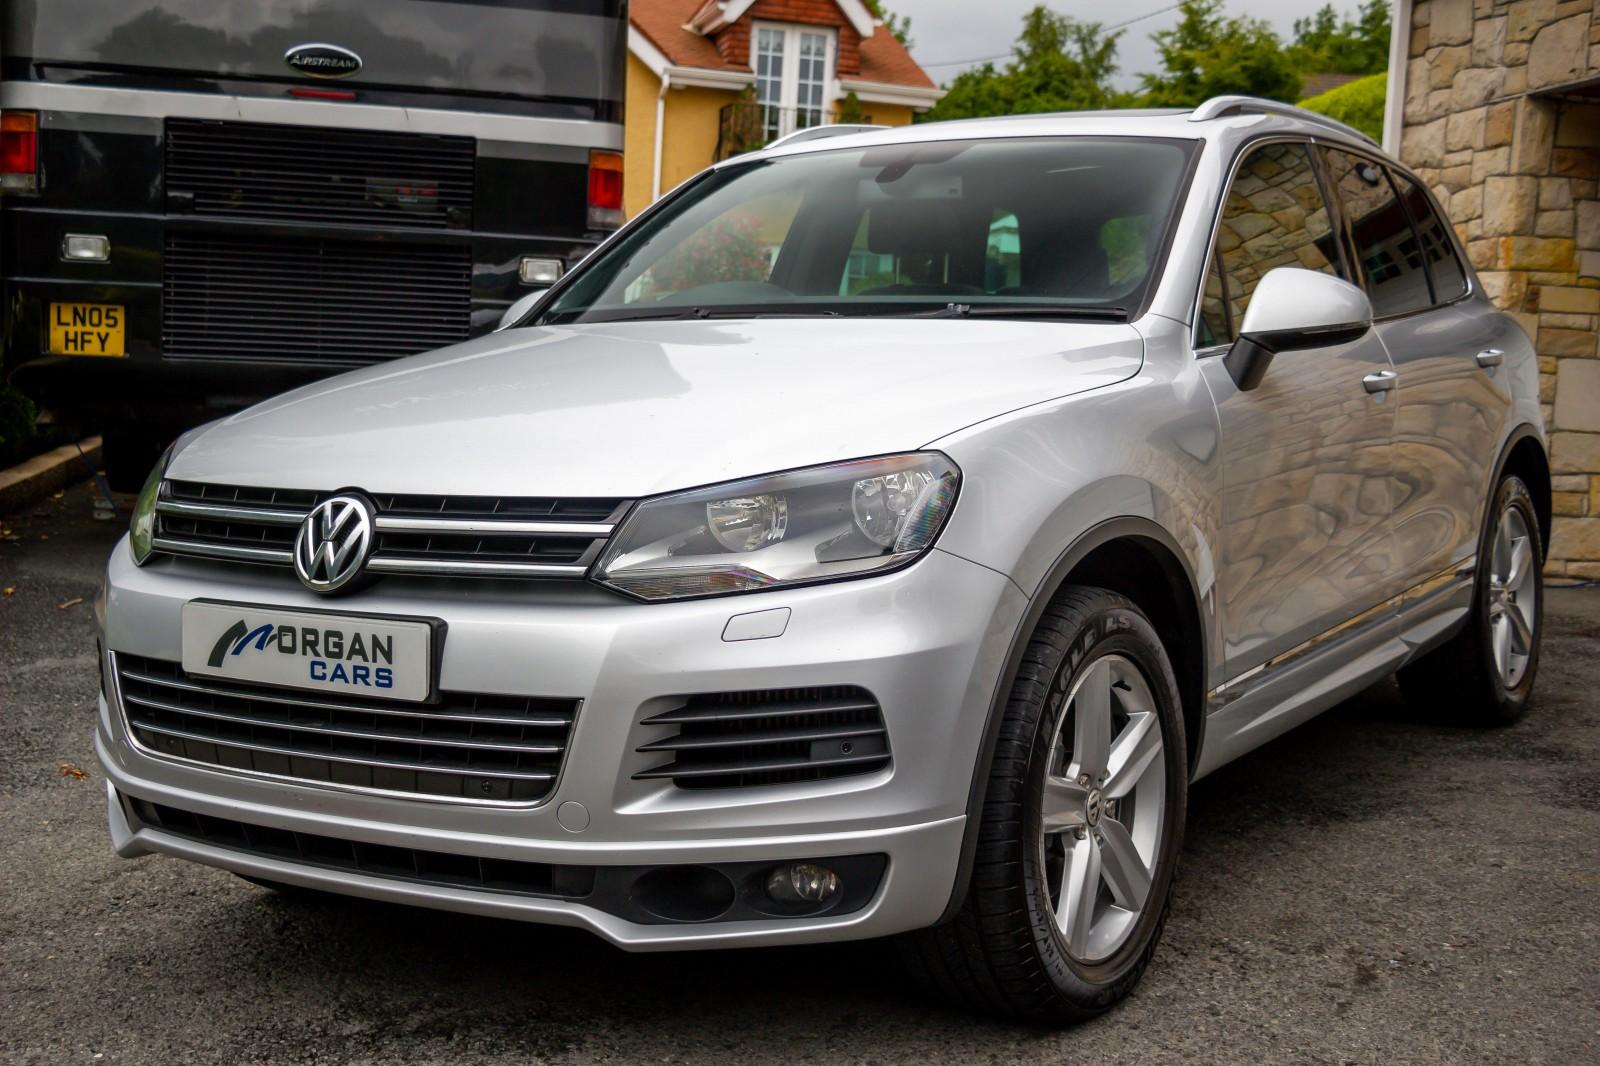 2011 Volkswagen Touareg V6 ALTITUDE TDI BLUEMOTION TECHNOLOGY Diesel Automatic – Morgan Cars 9 Mound Road, Warrenpoint, Newry BT34 3LW, UK full